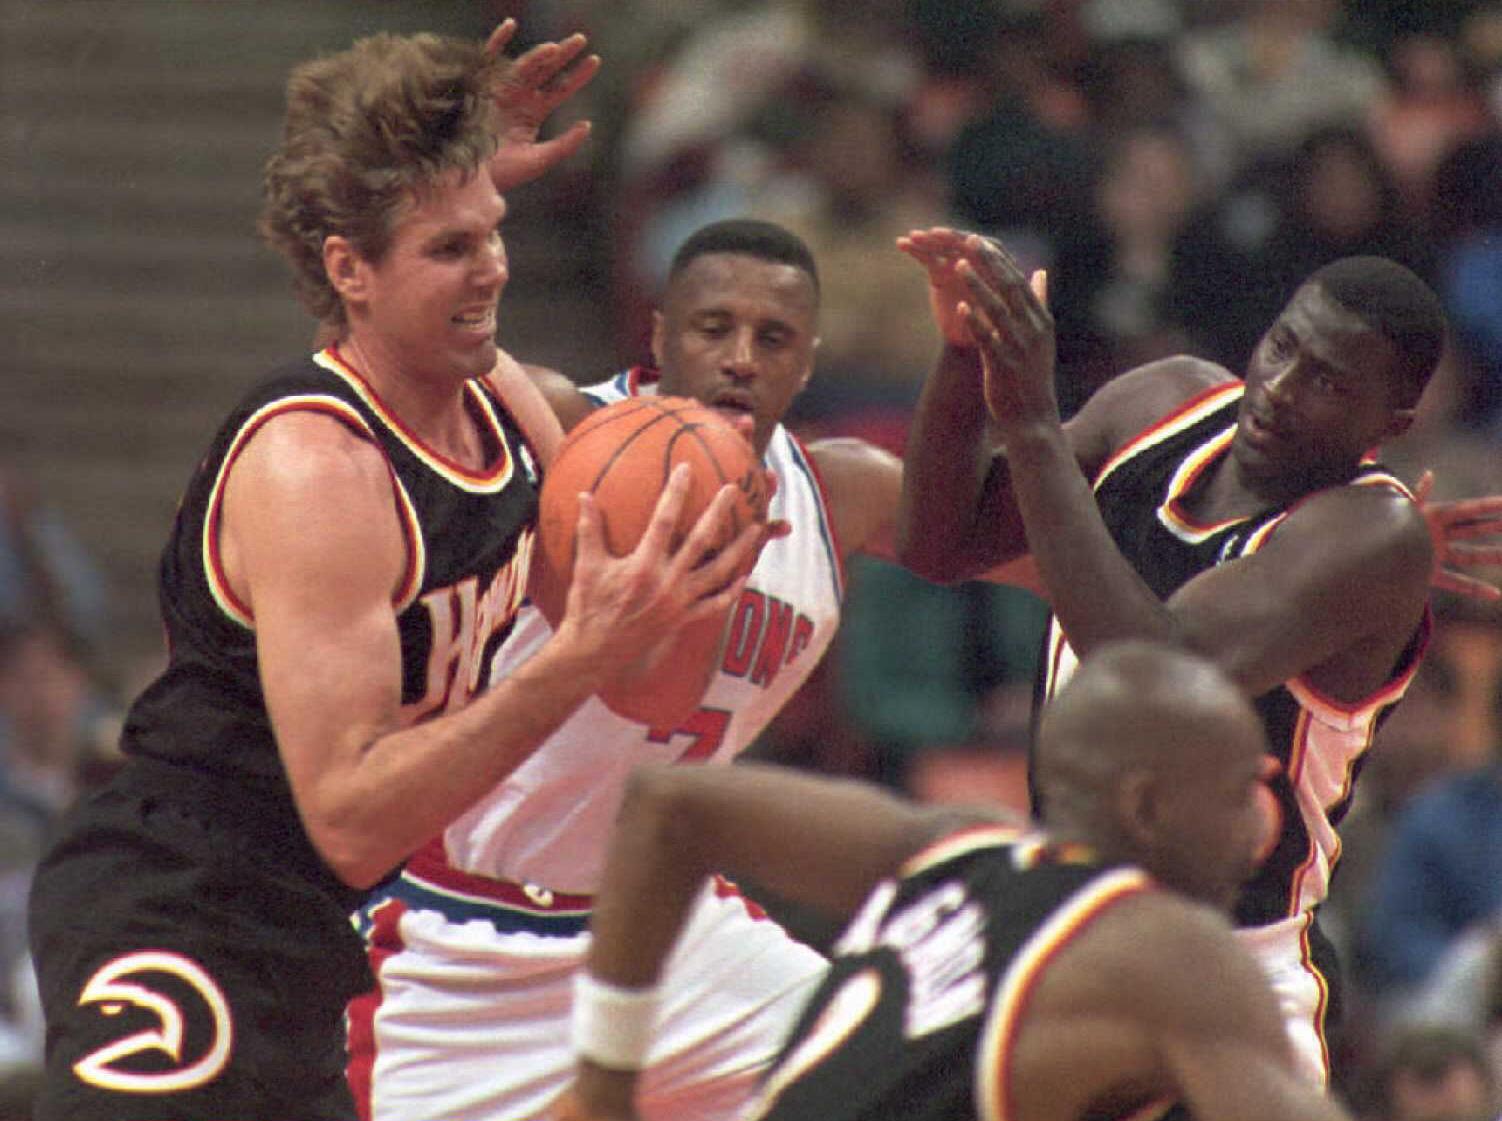 Jon Koncak Once Made More Money Than Michael Jordan and Larry Bird, Earning the Nickname 'Jon Contract'